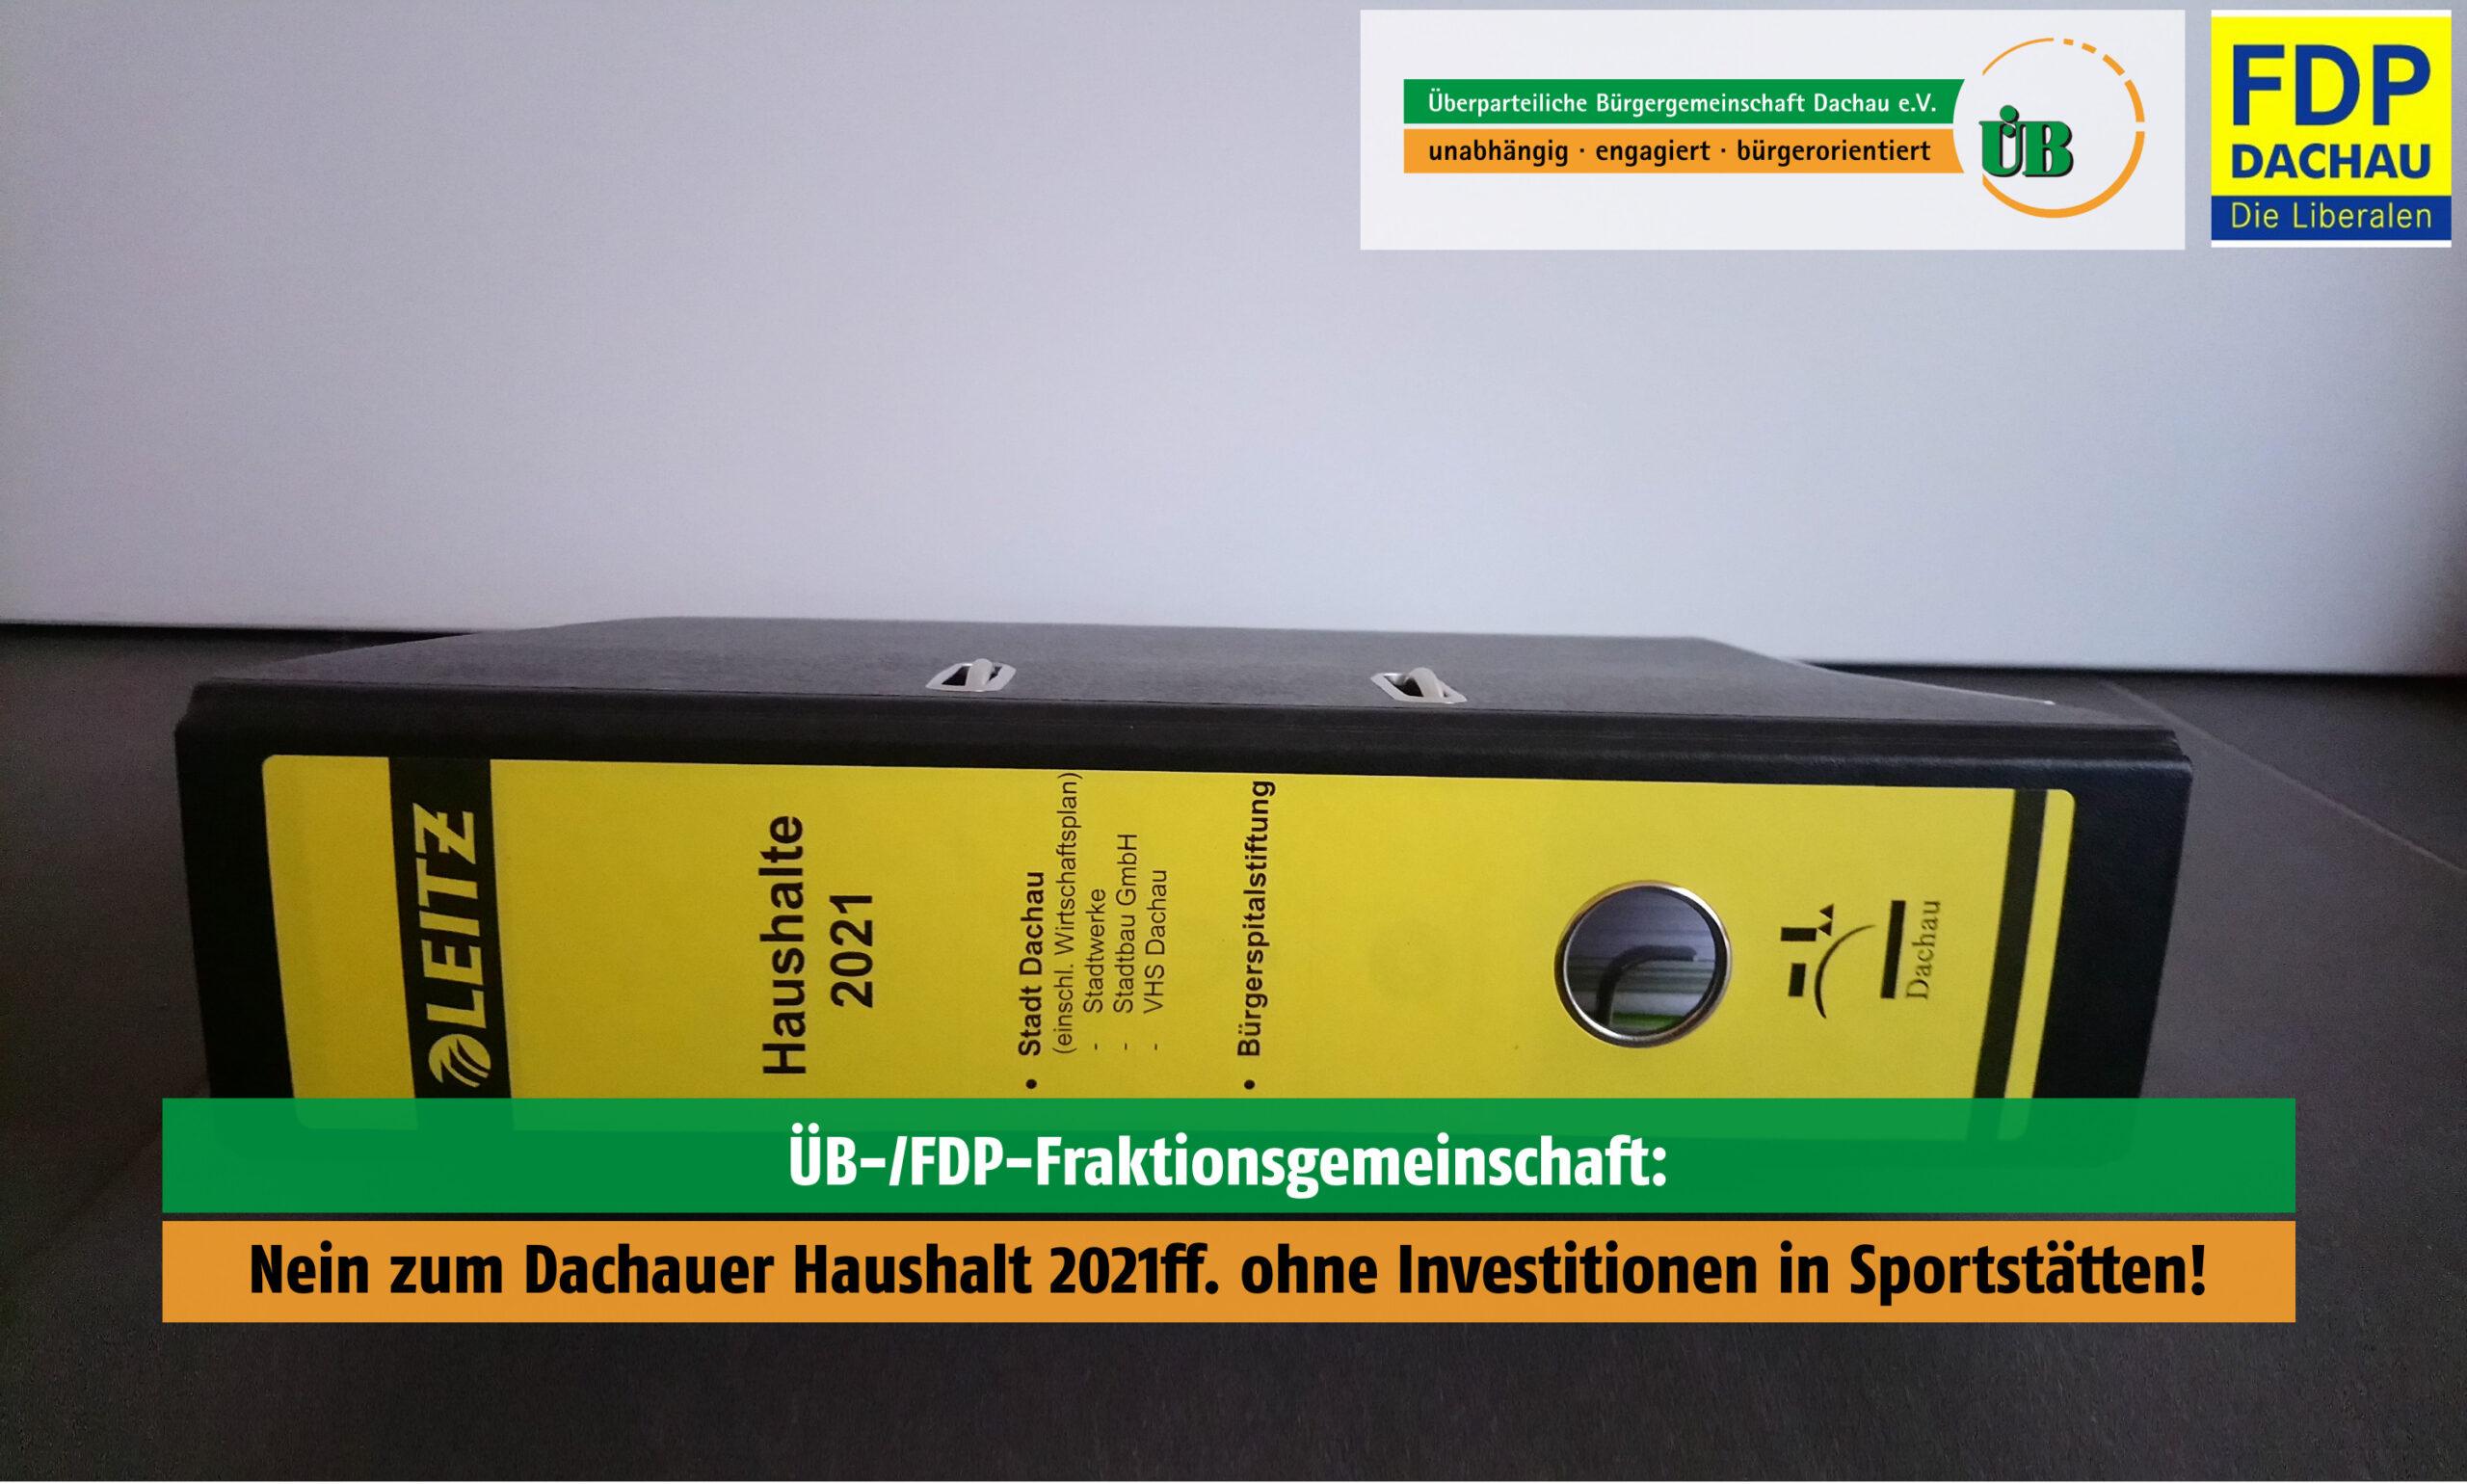 FDP-ÜB-Fraktion in Dachau zum Haushalt 2021.